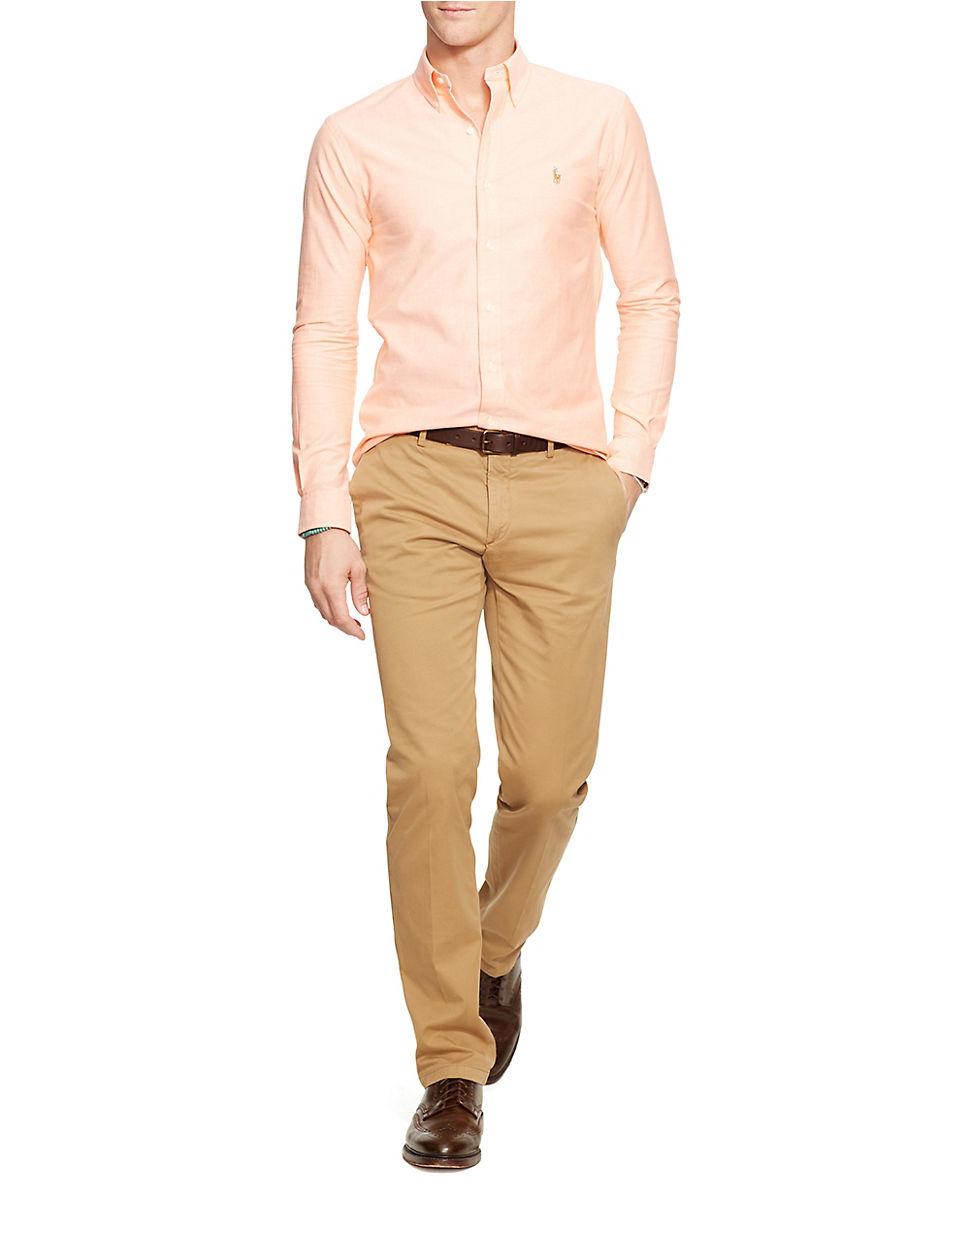 polo ralph lauren slim fit stretch oxford shirt in orange. Black Bedroom Furniture Sets. Home Design Ideas